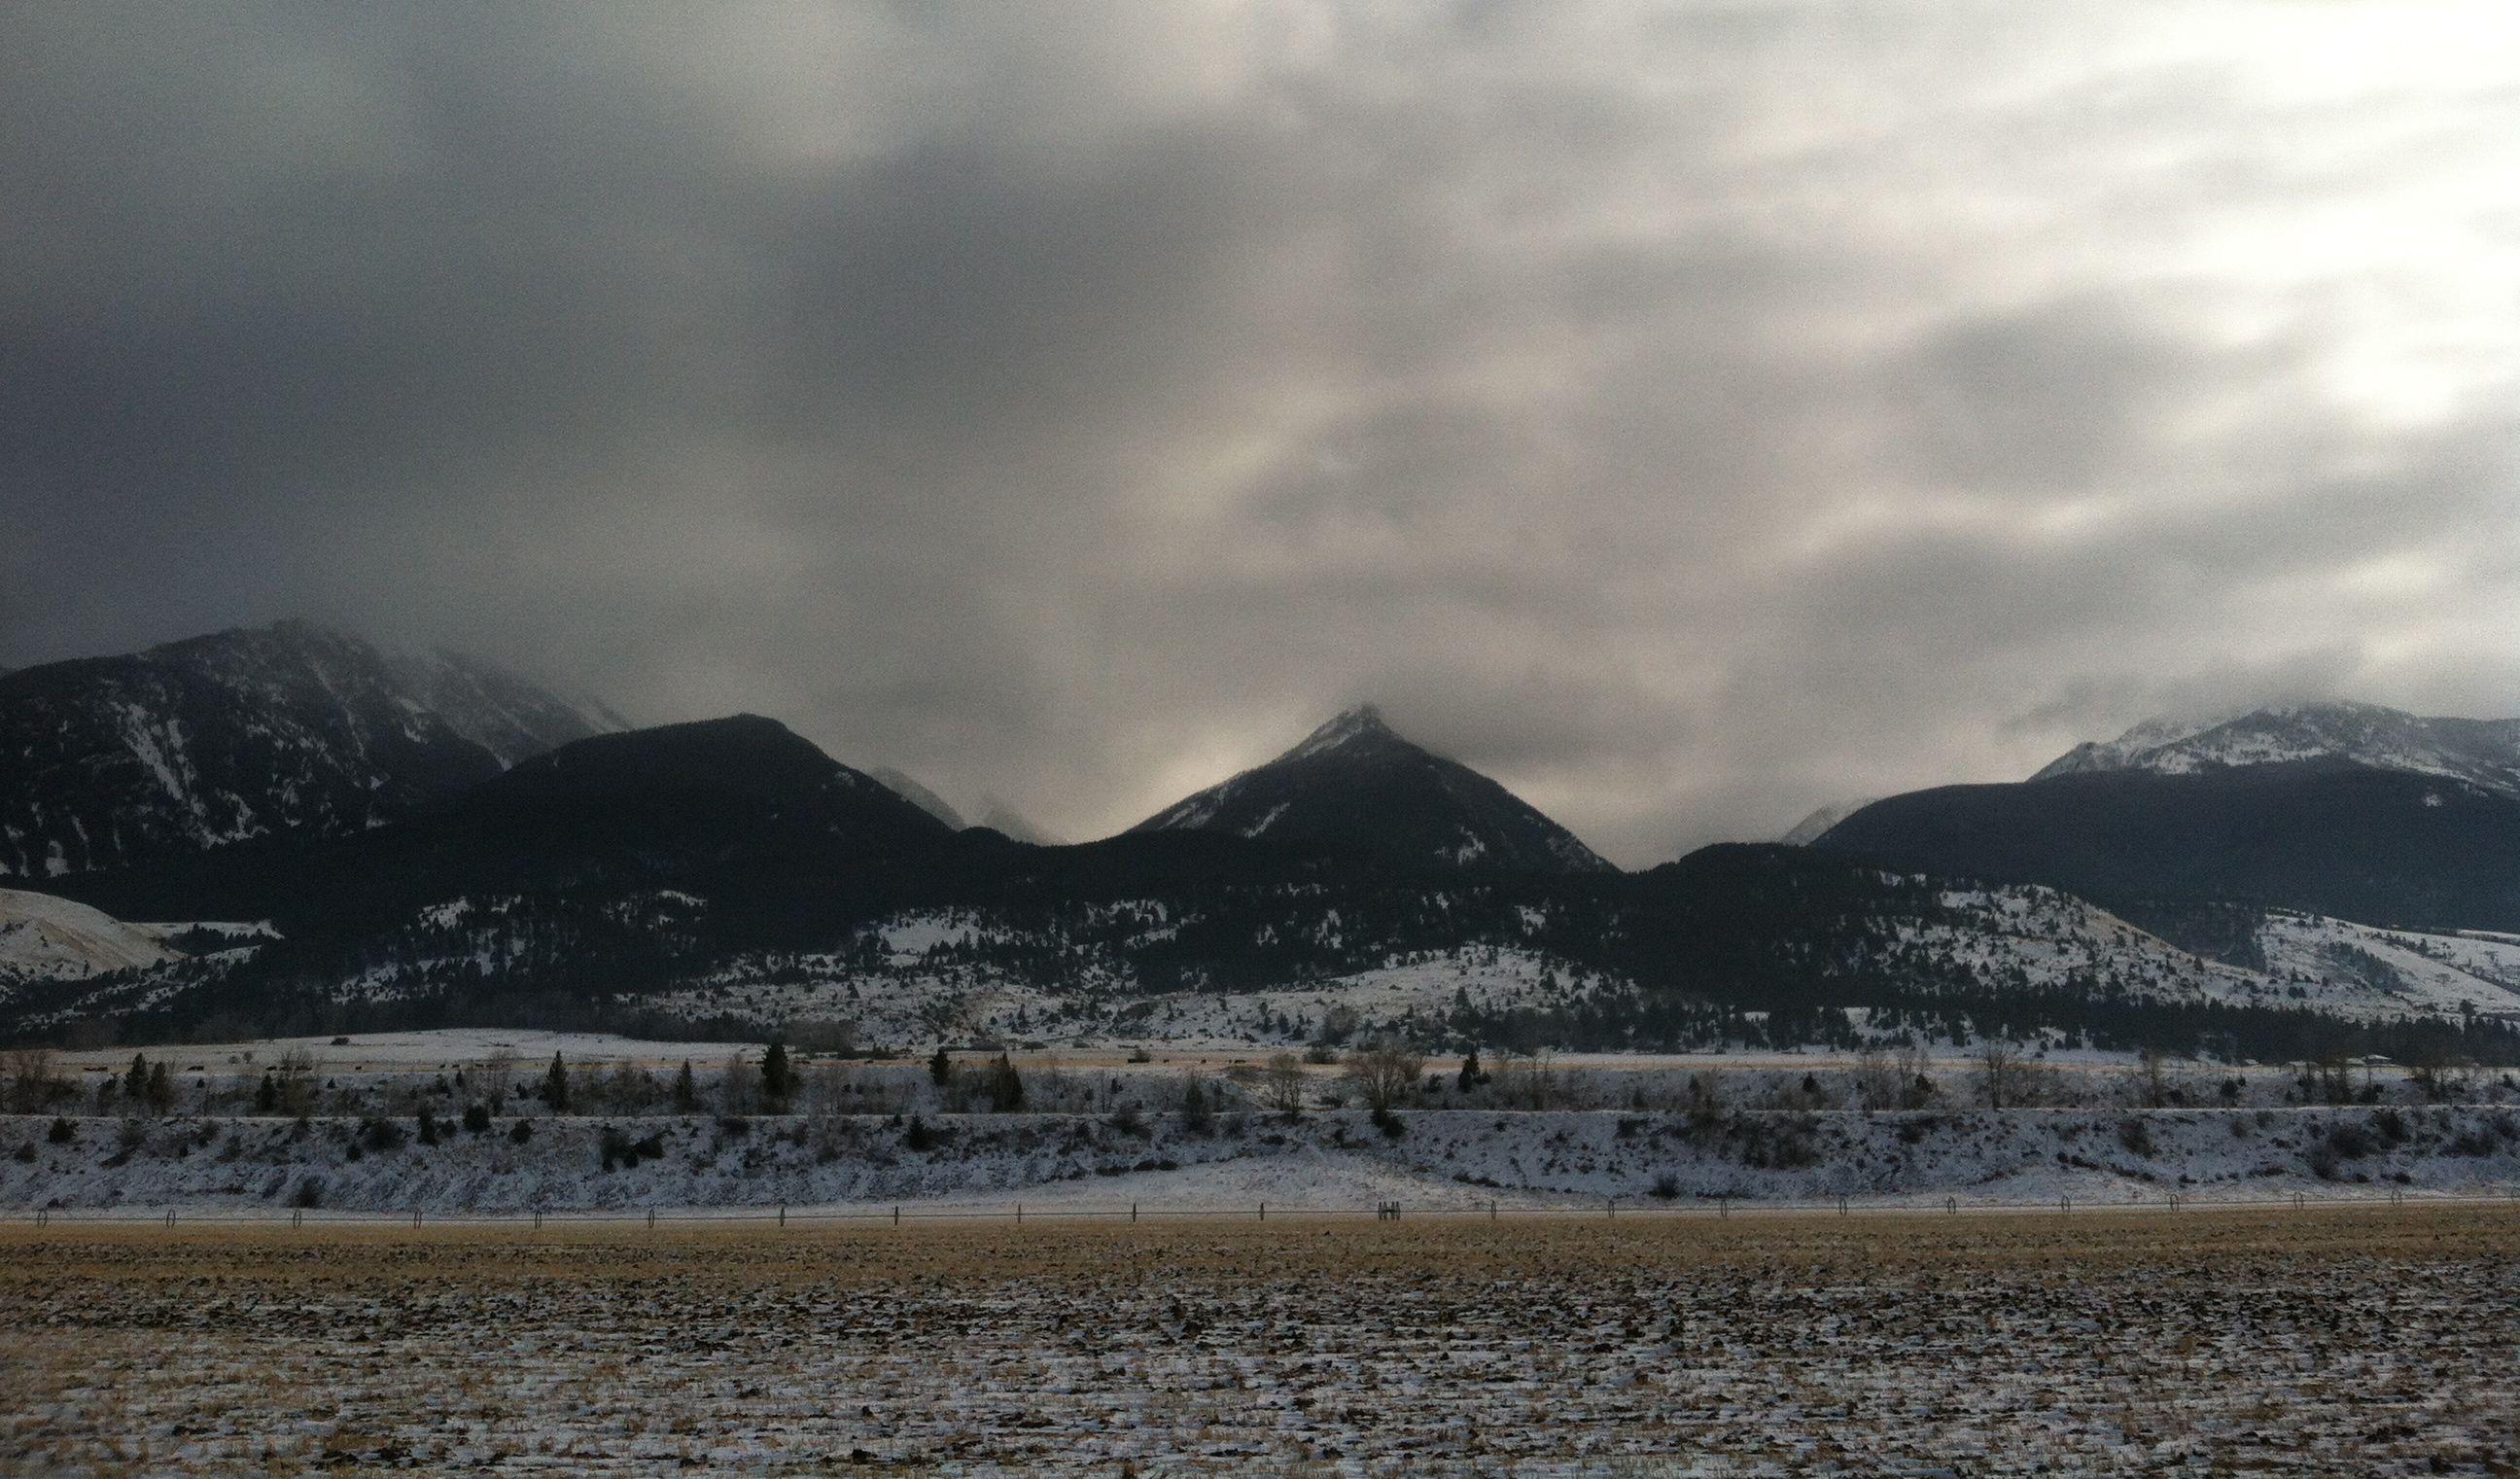 montana winter - Google Search